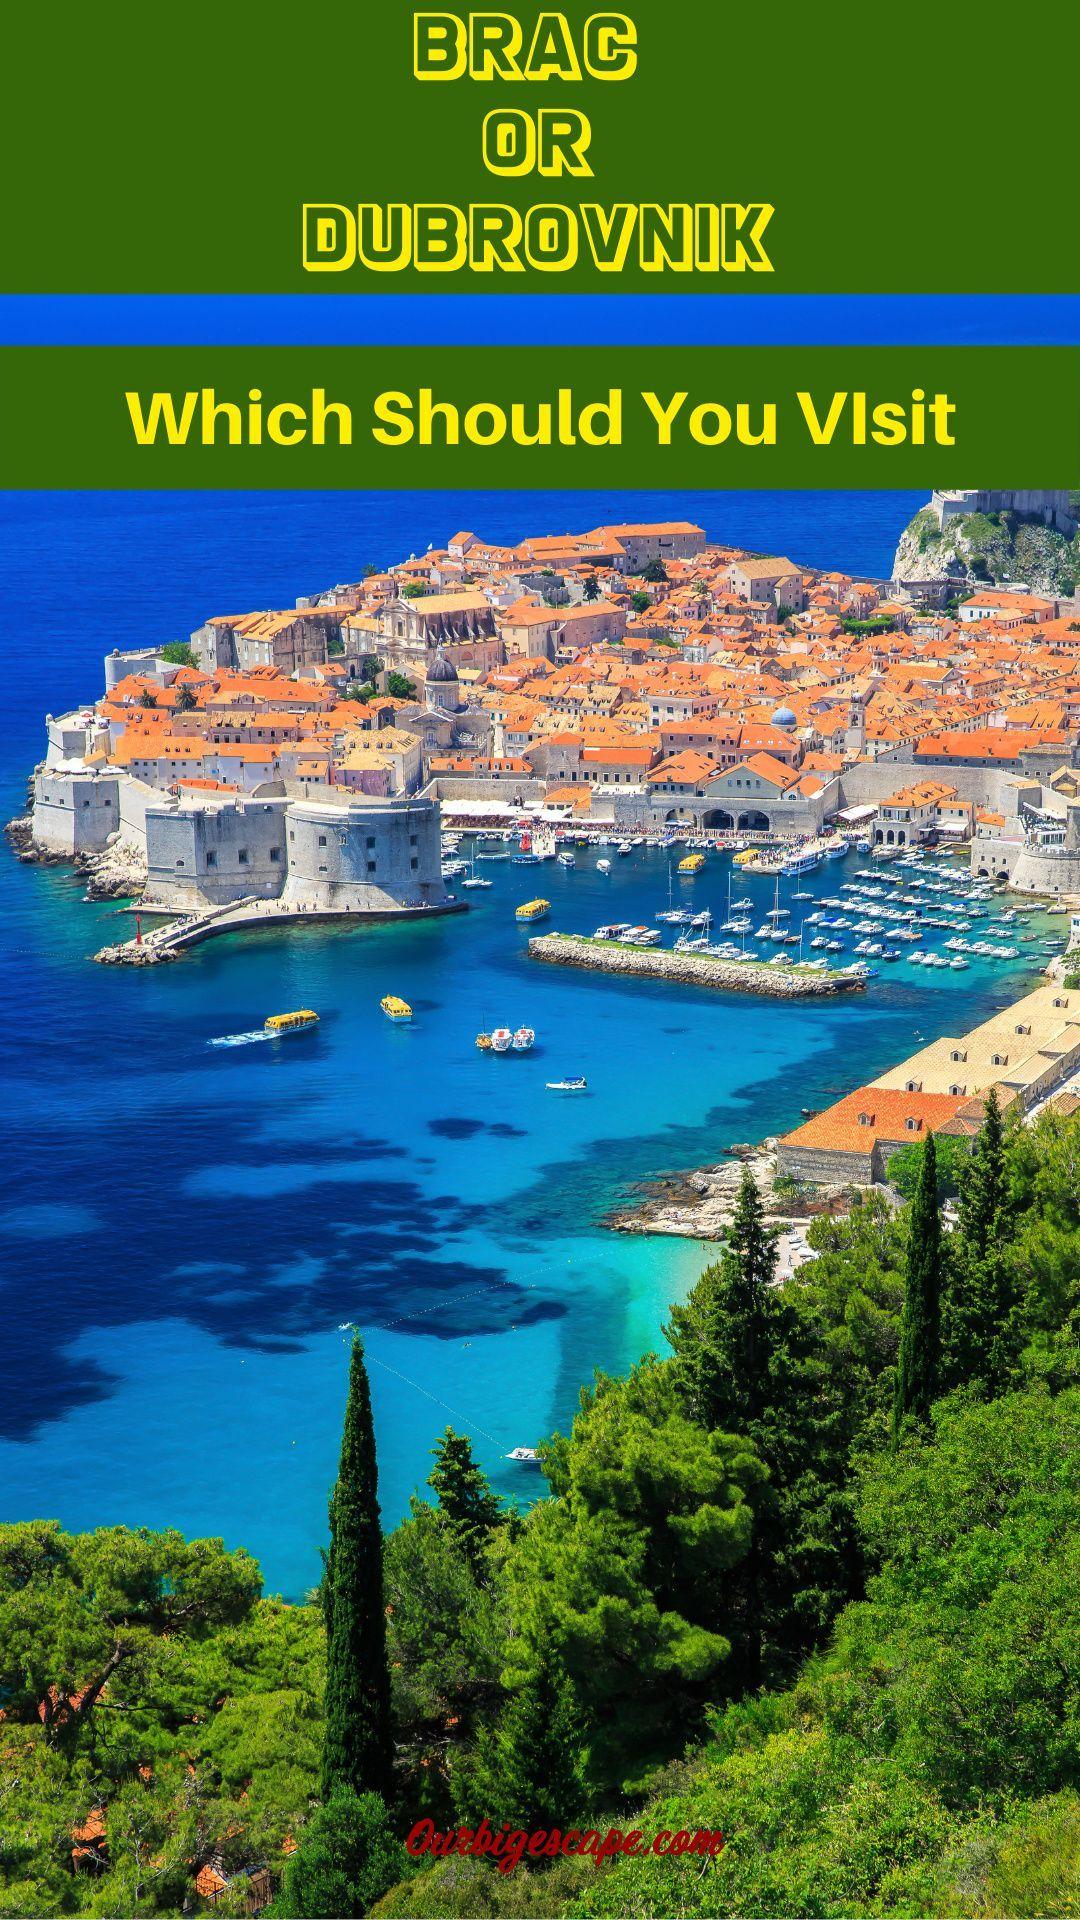 Brac Croatia Vs Dubrovnik Croatia In 2020 Croatia Destinations Plitvice Lakes National Park Croatia Travel